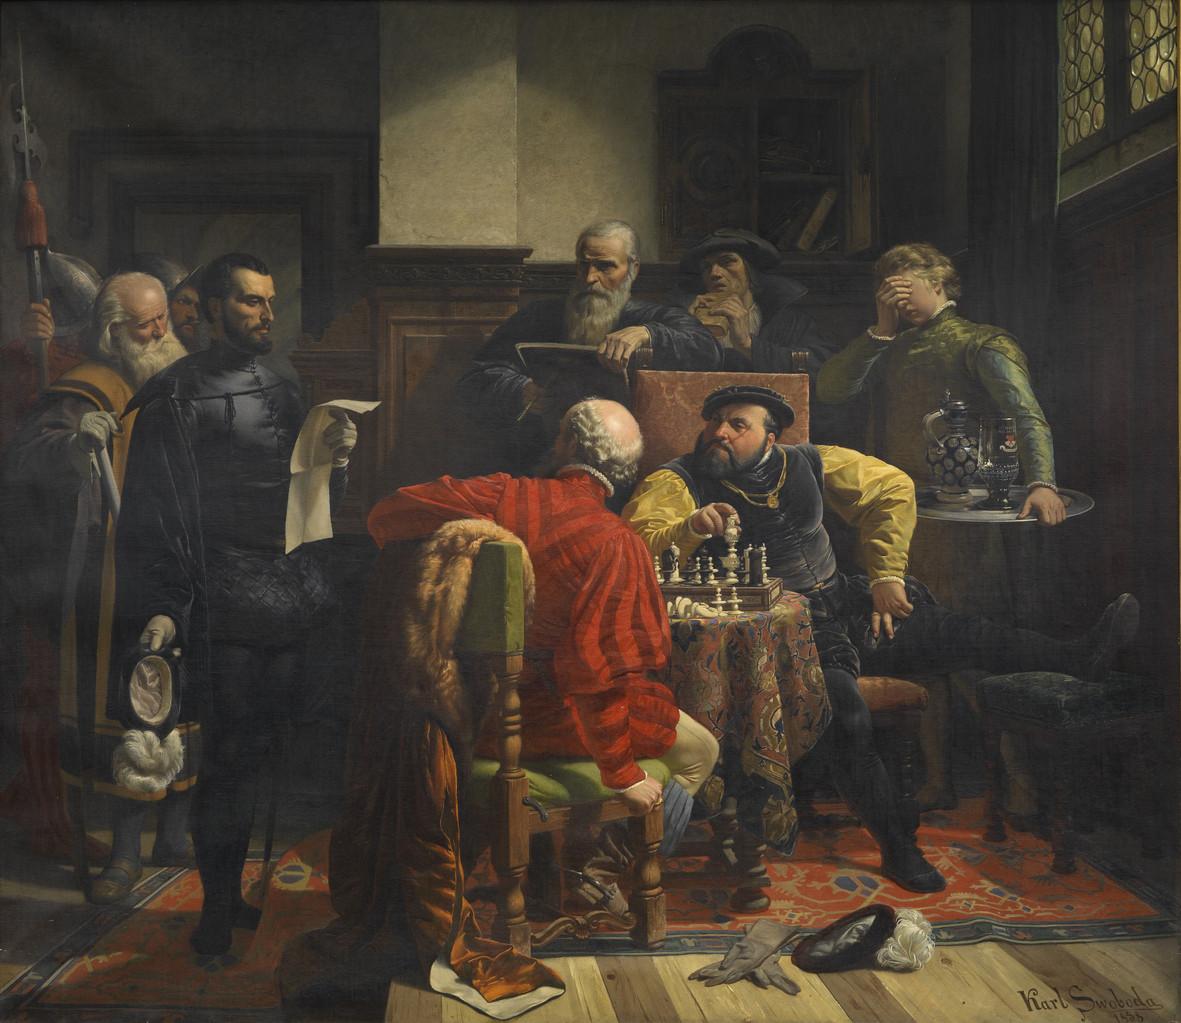 Karl Swoboda 1897